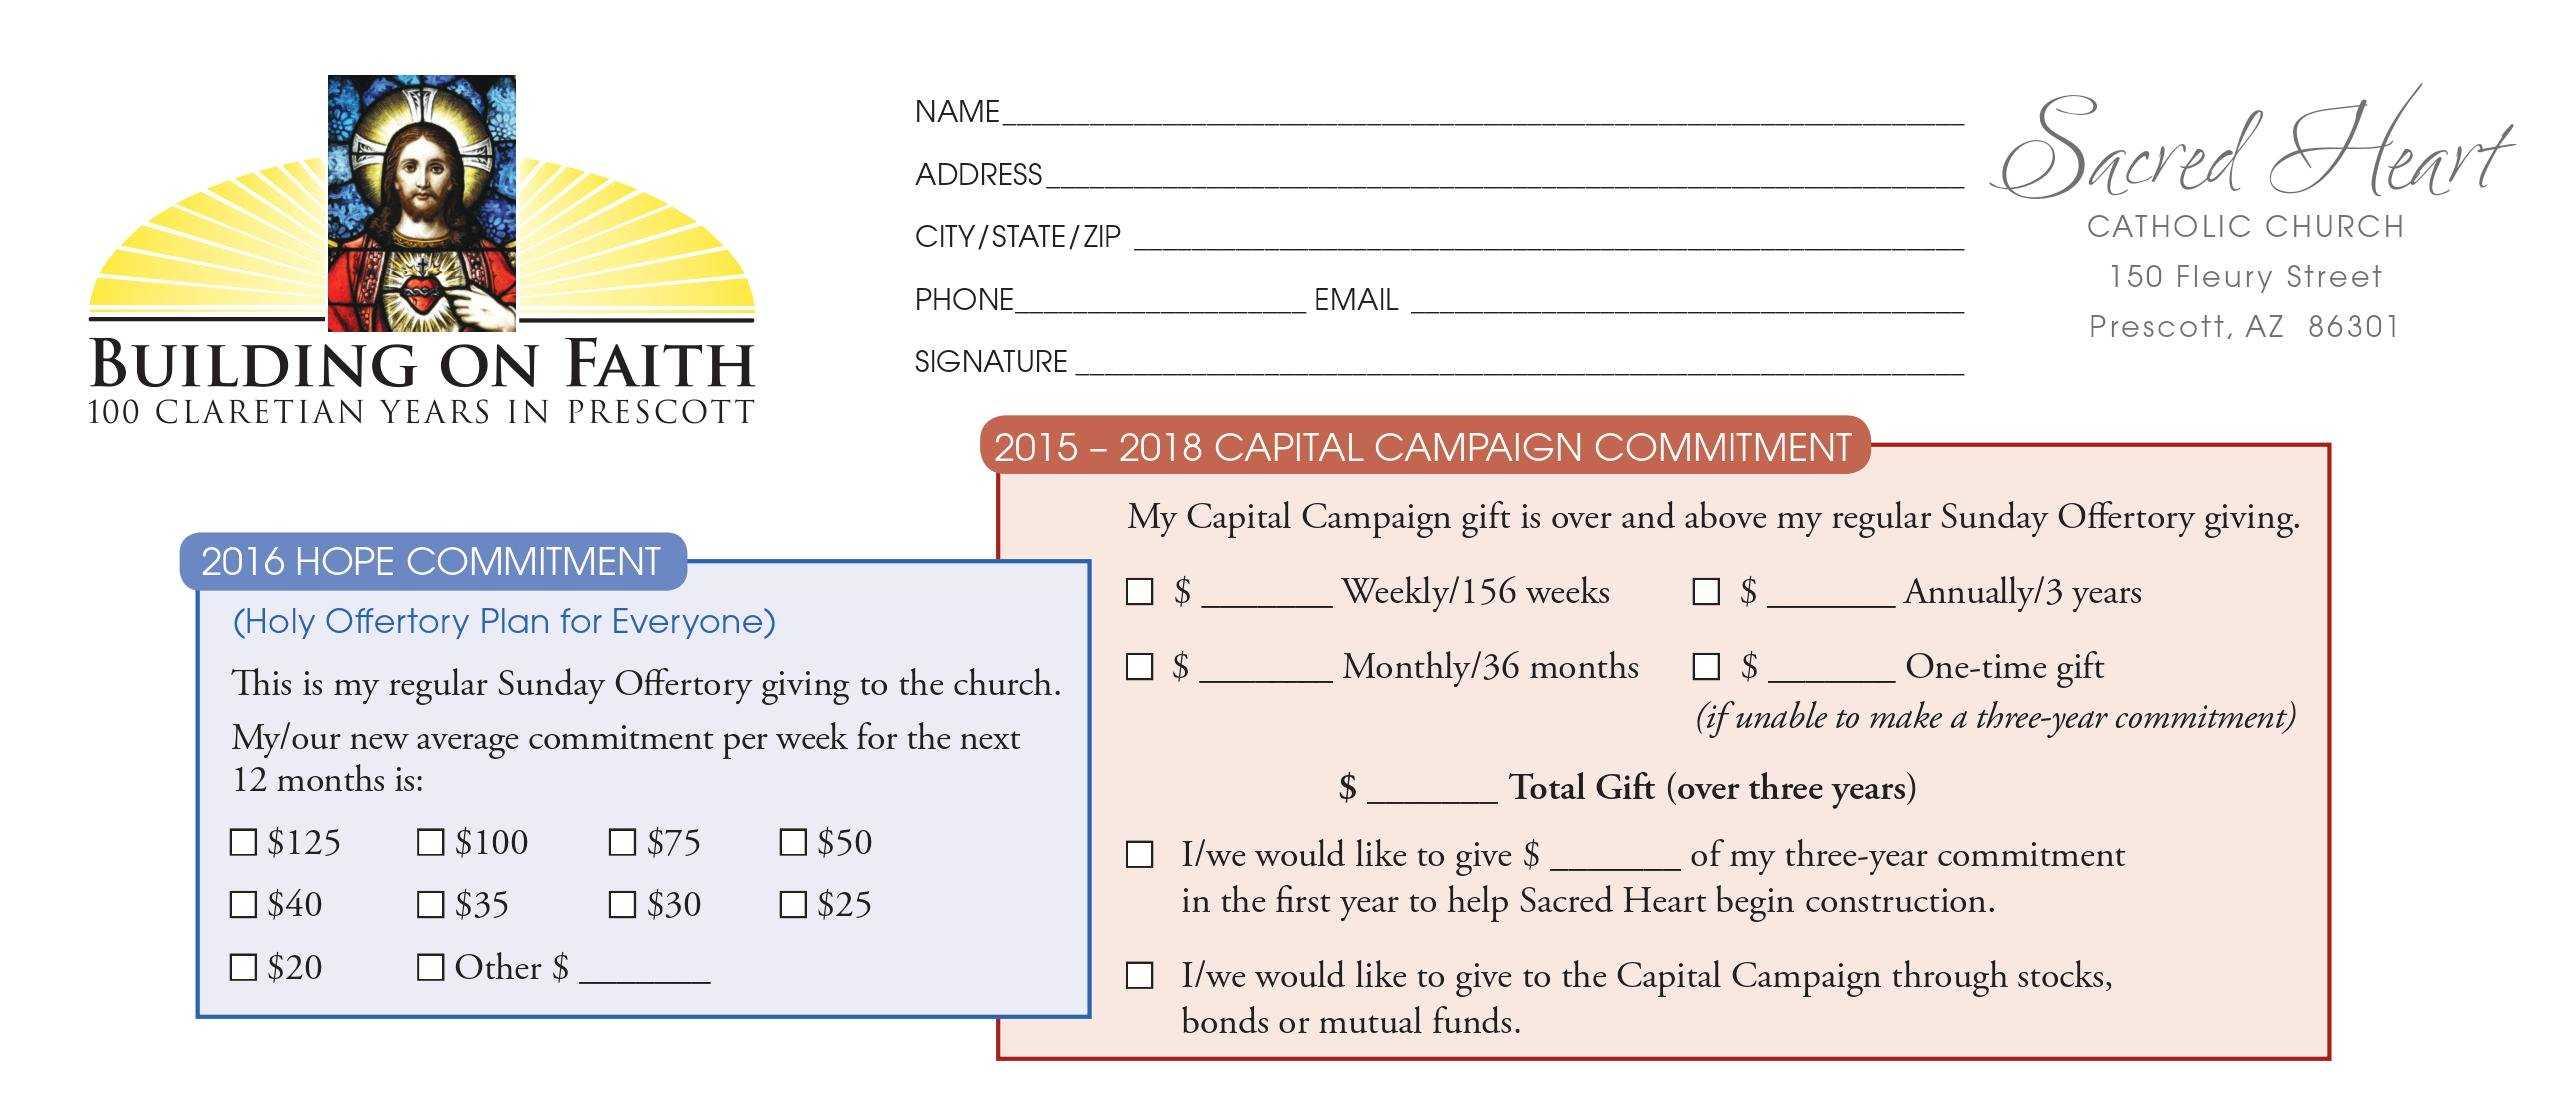 Pledge Card Sample - Karan.ald2014 Throughout Fundraising Pledge Card Template